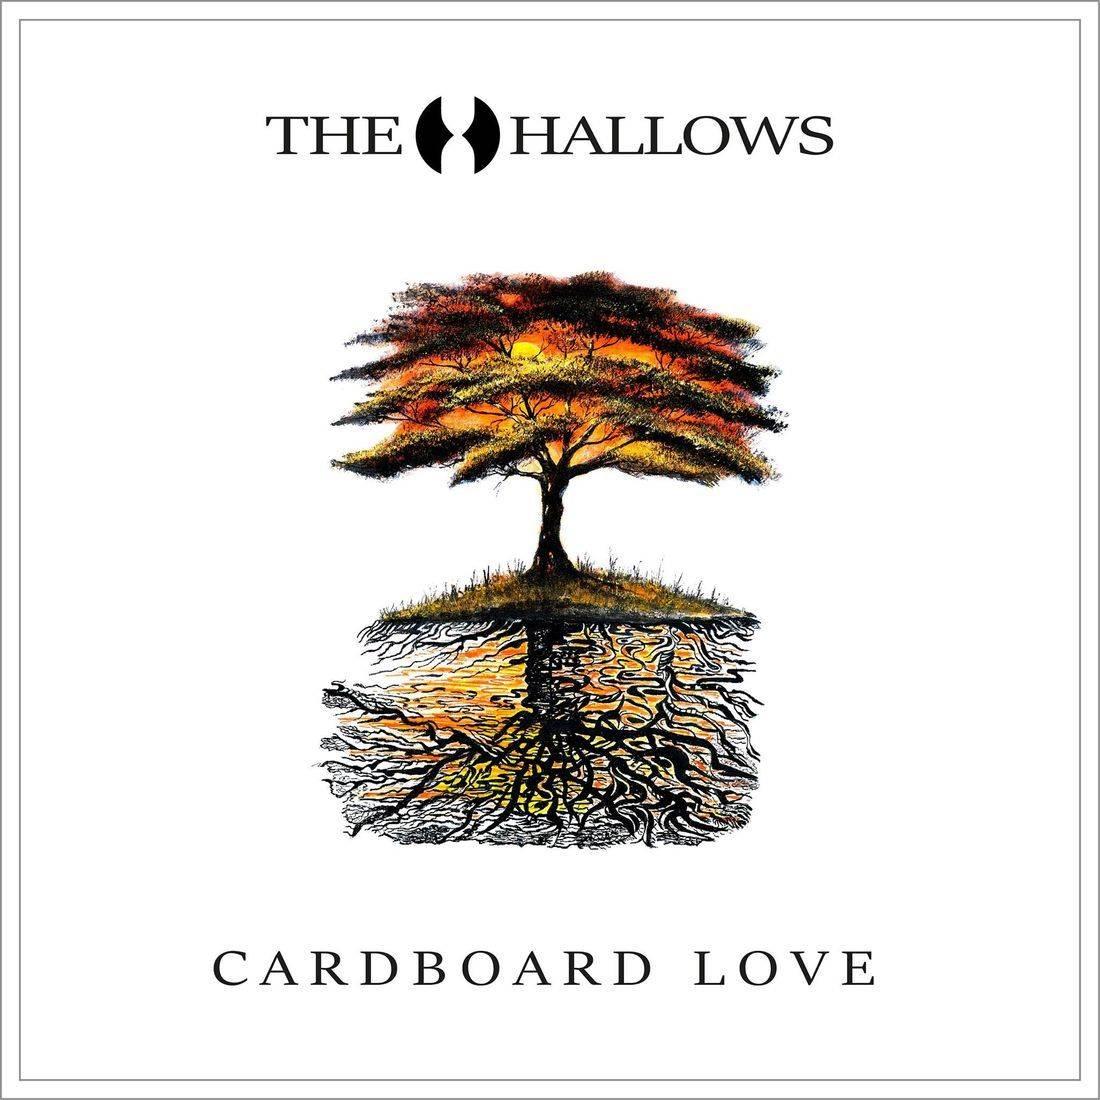 The Hallows Cardboard Love